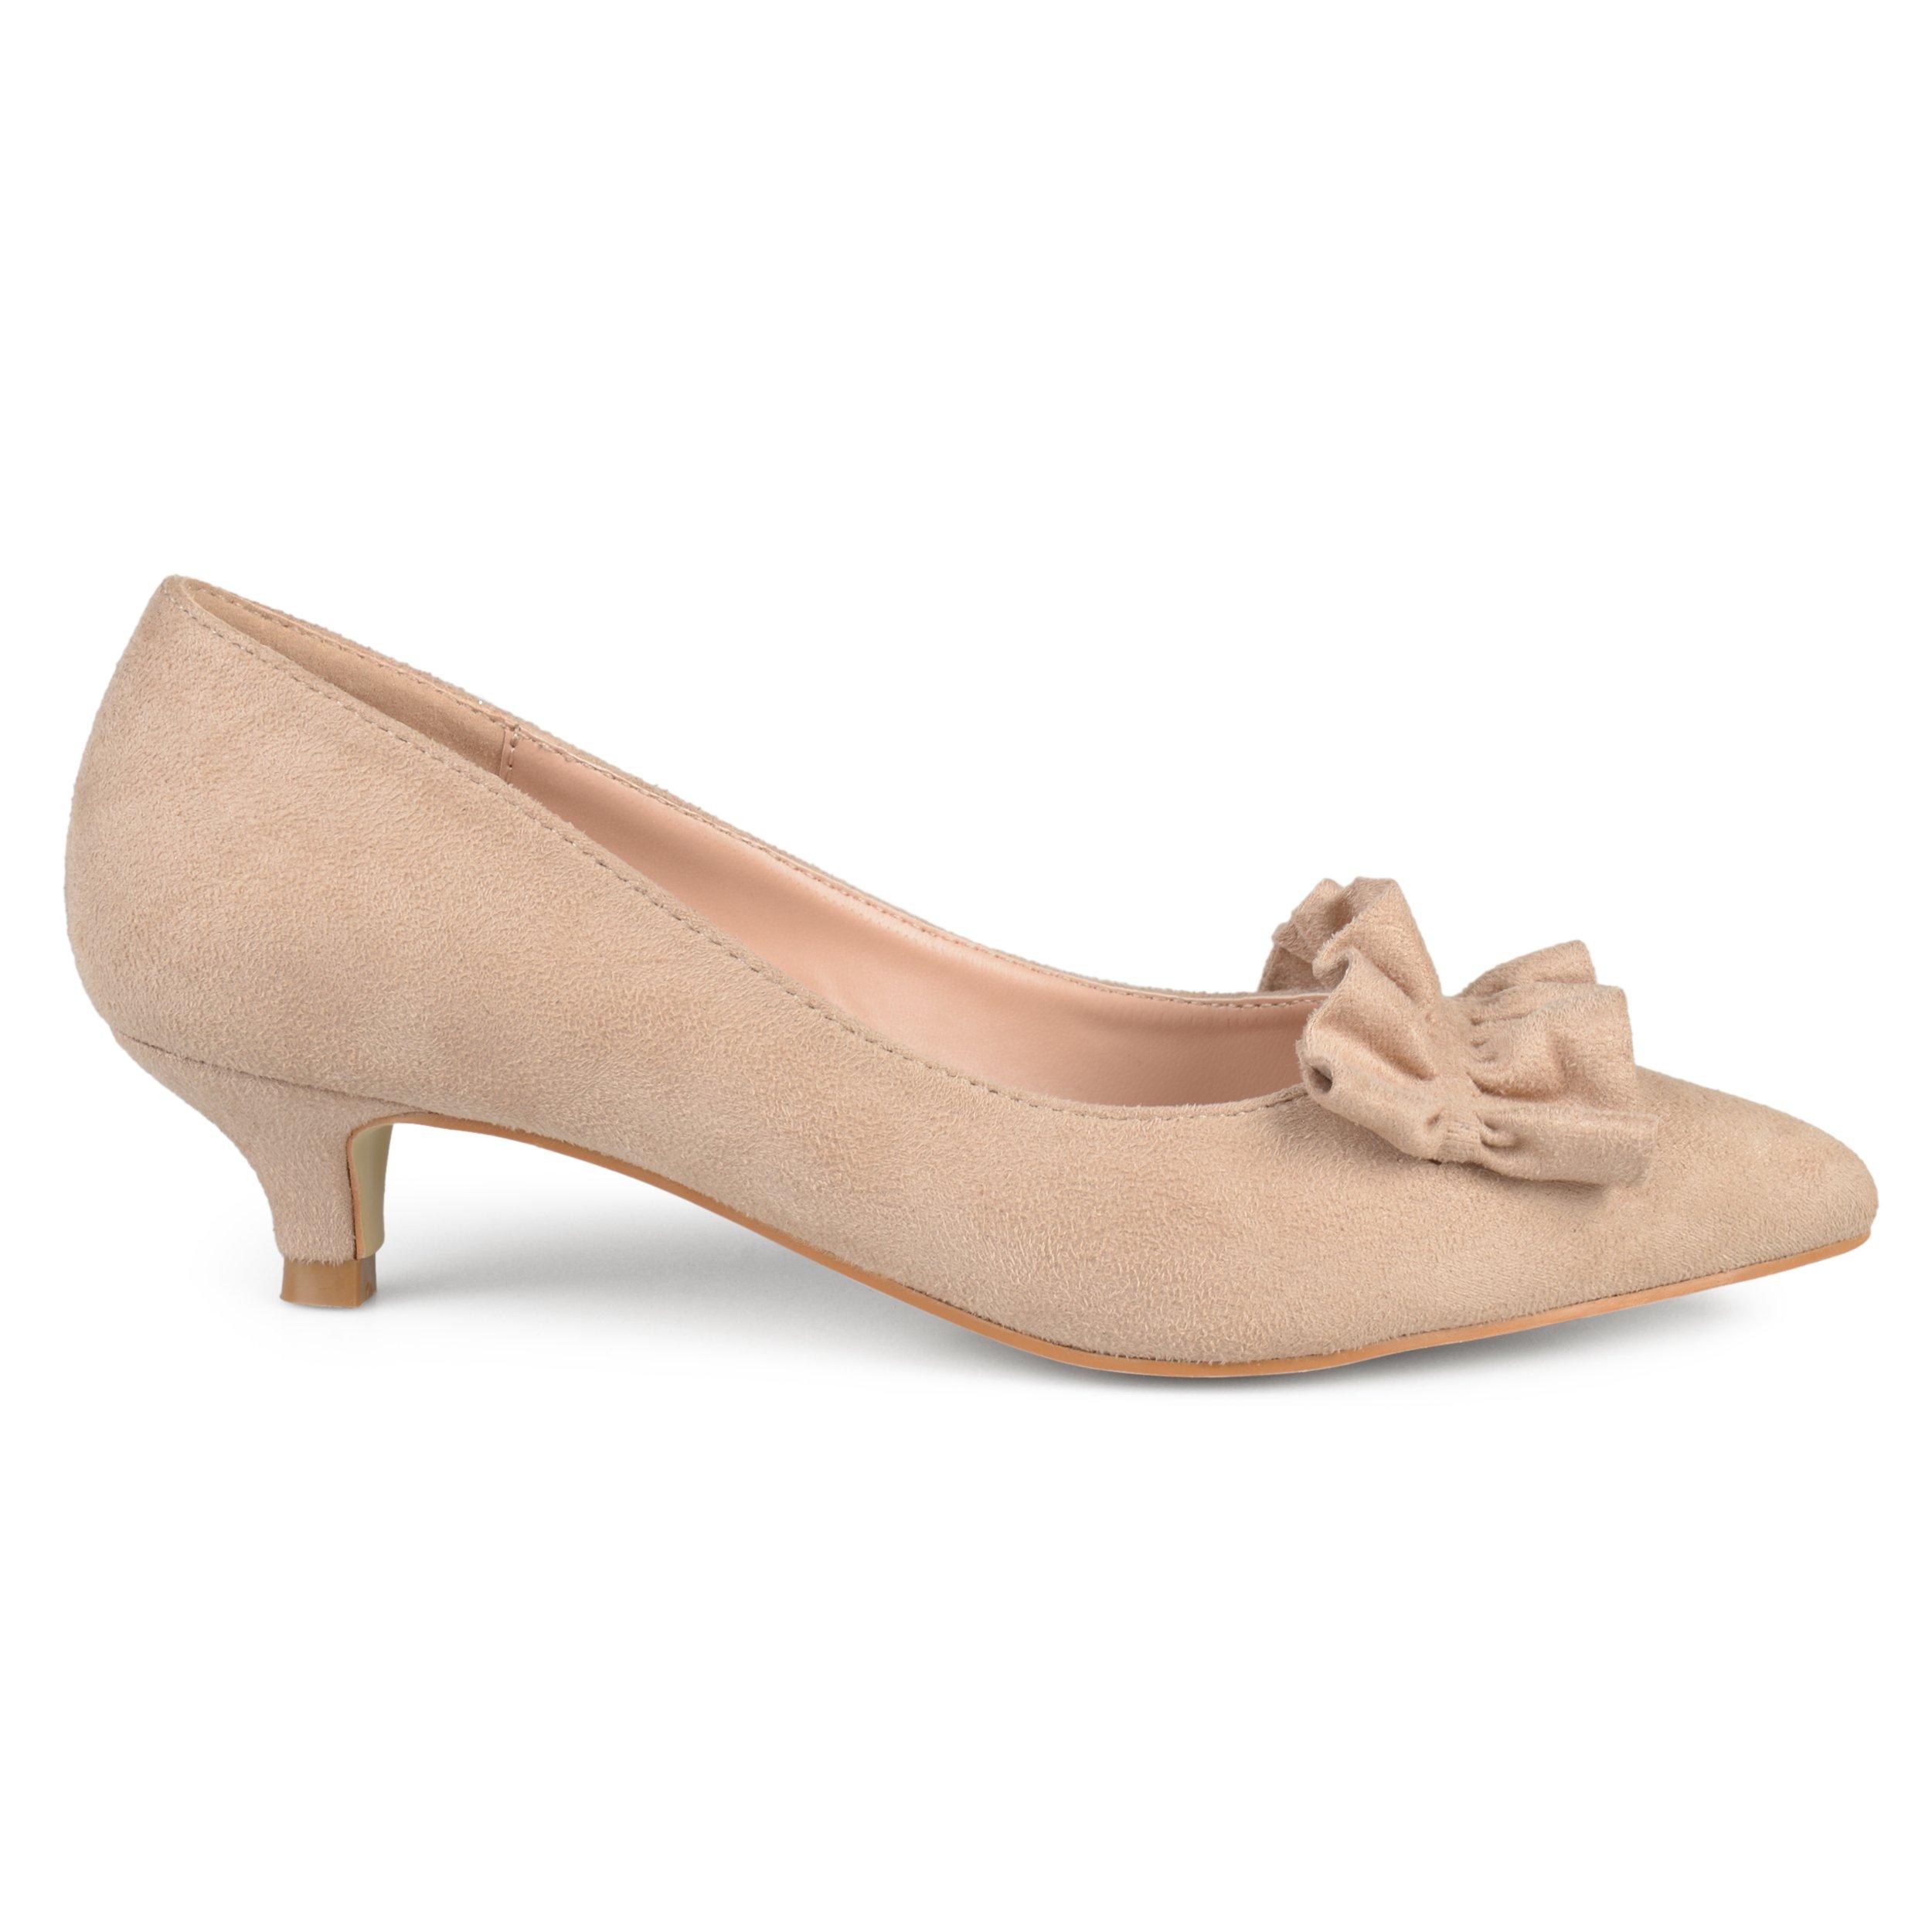 Brinley Co. Womens Faux Suede Ruffle Kitten Heels Taupe, 8.5 Regular US